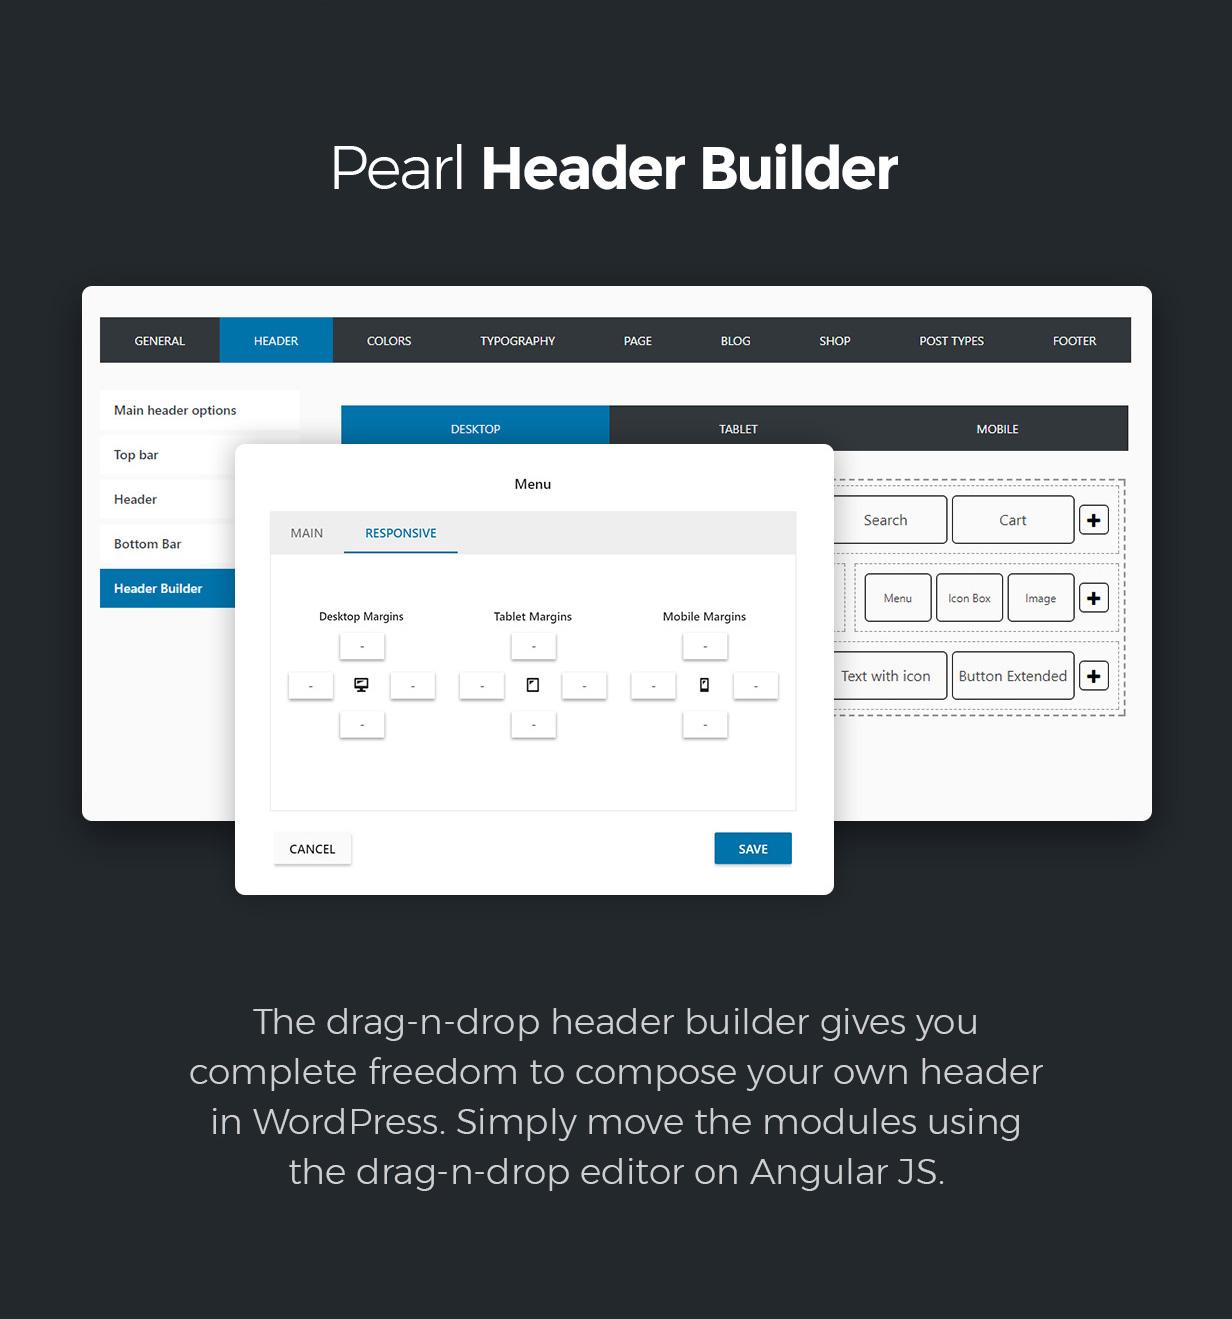 header builder - Pearl - Corporate Business WordPress Theme